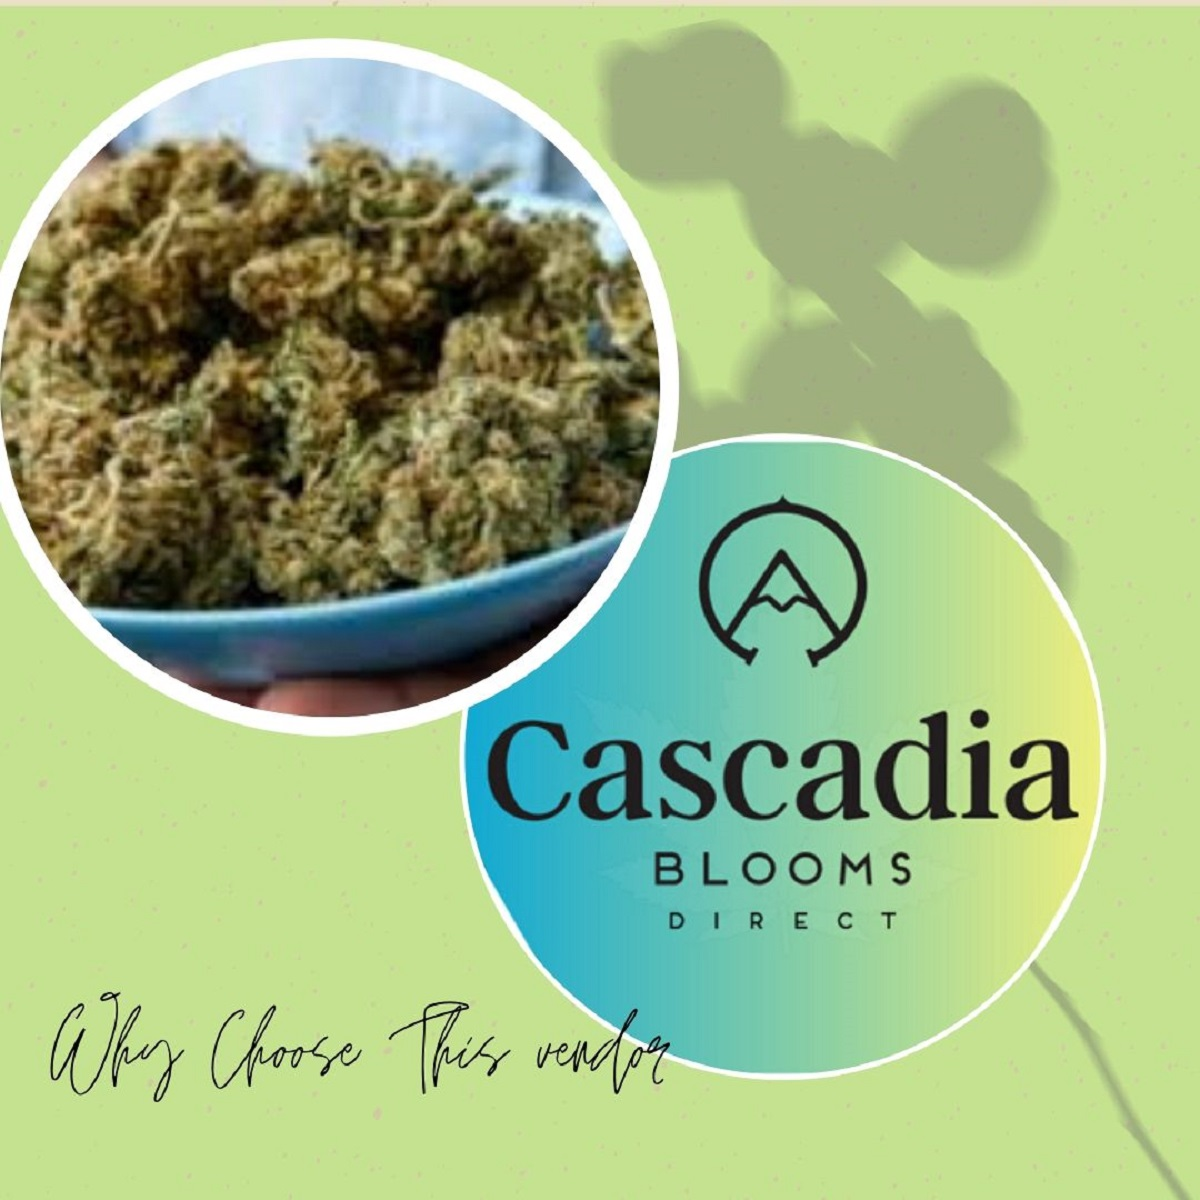 Cascadia Blooms Vendor